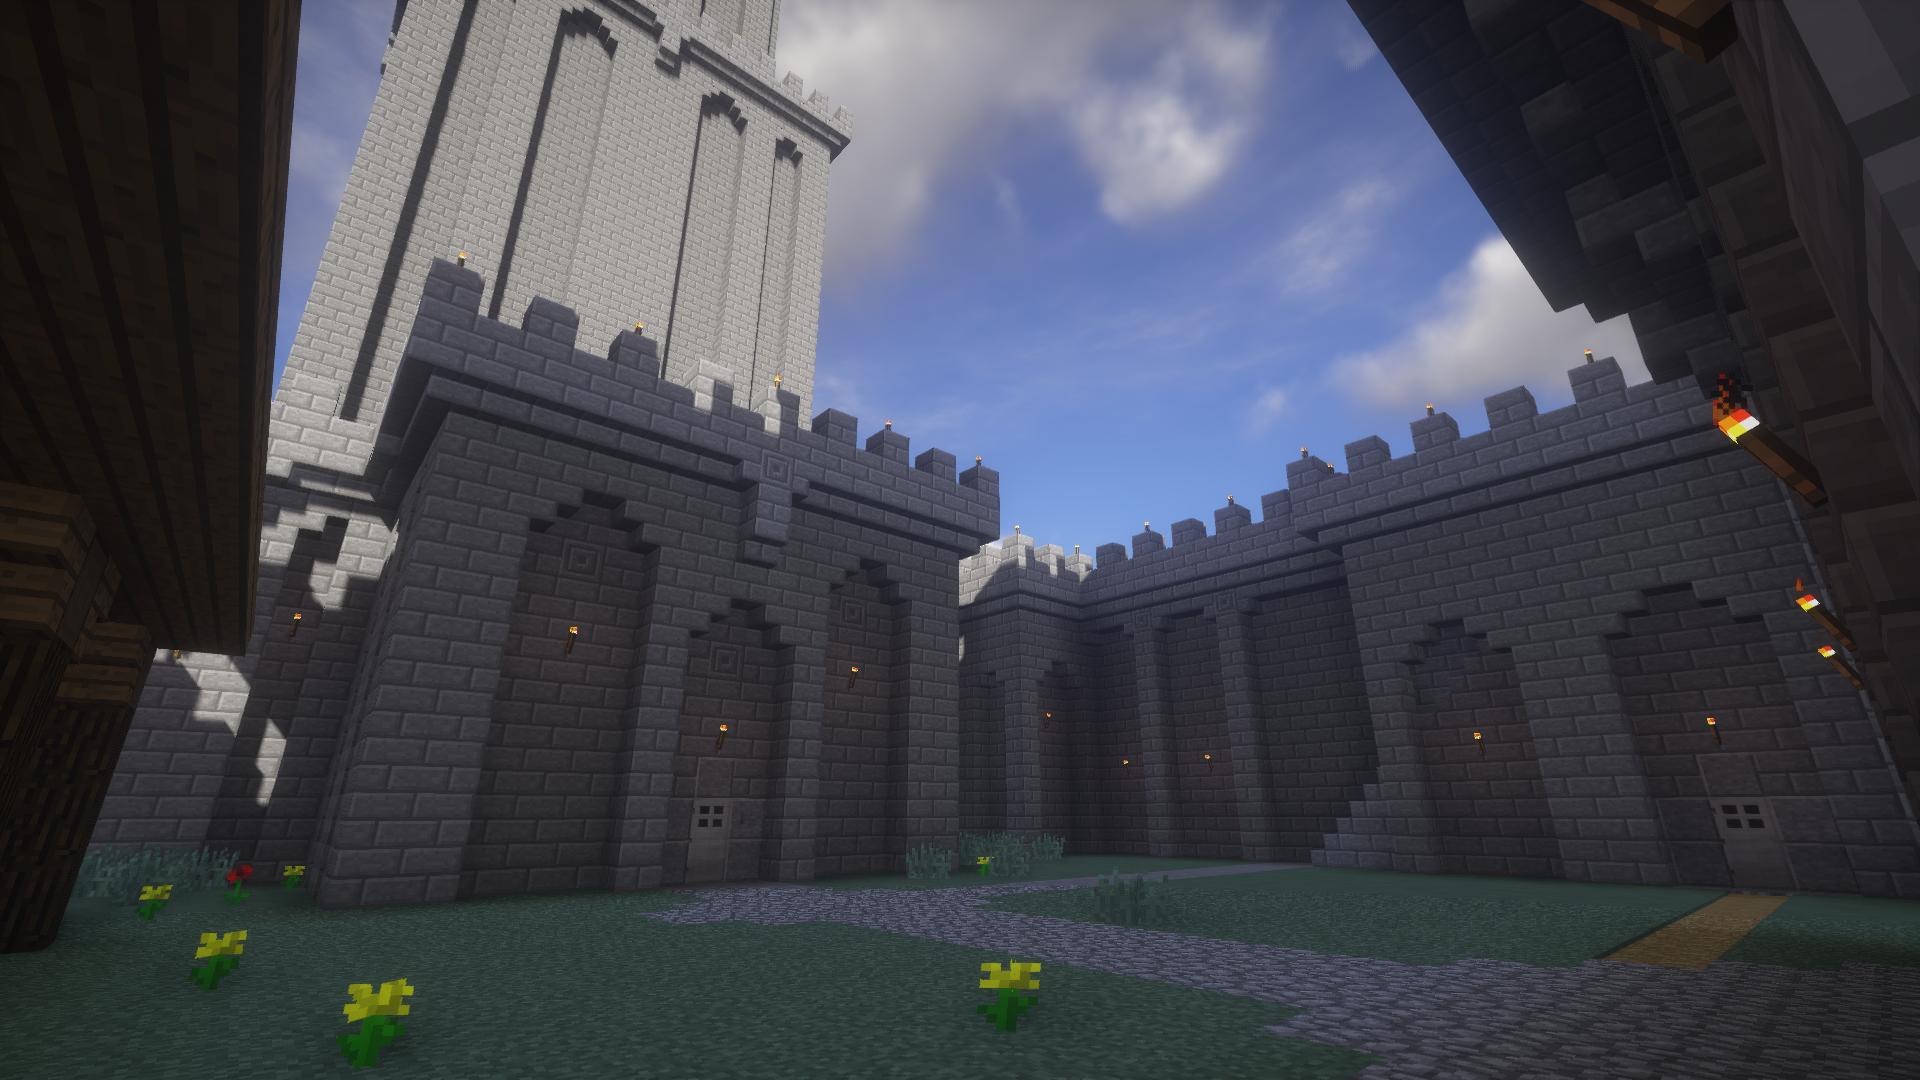 Minecraft Enchantment Sweeping Edge - Gambleh d